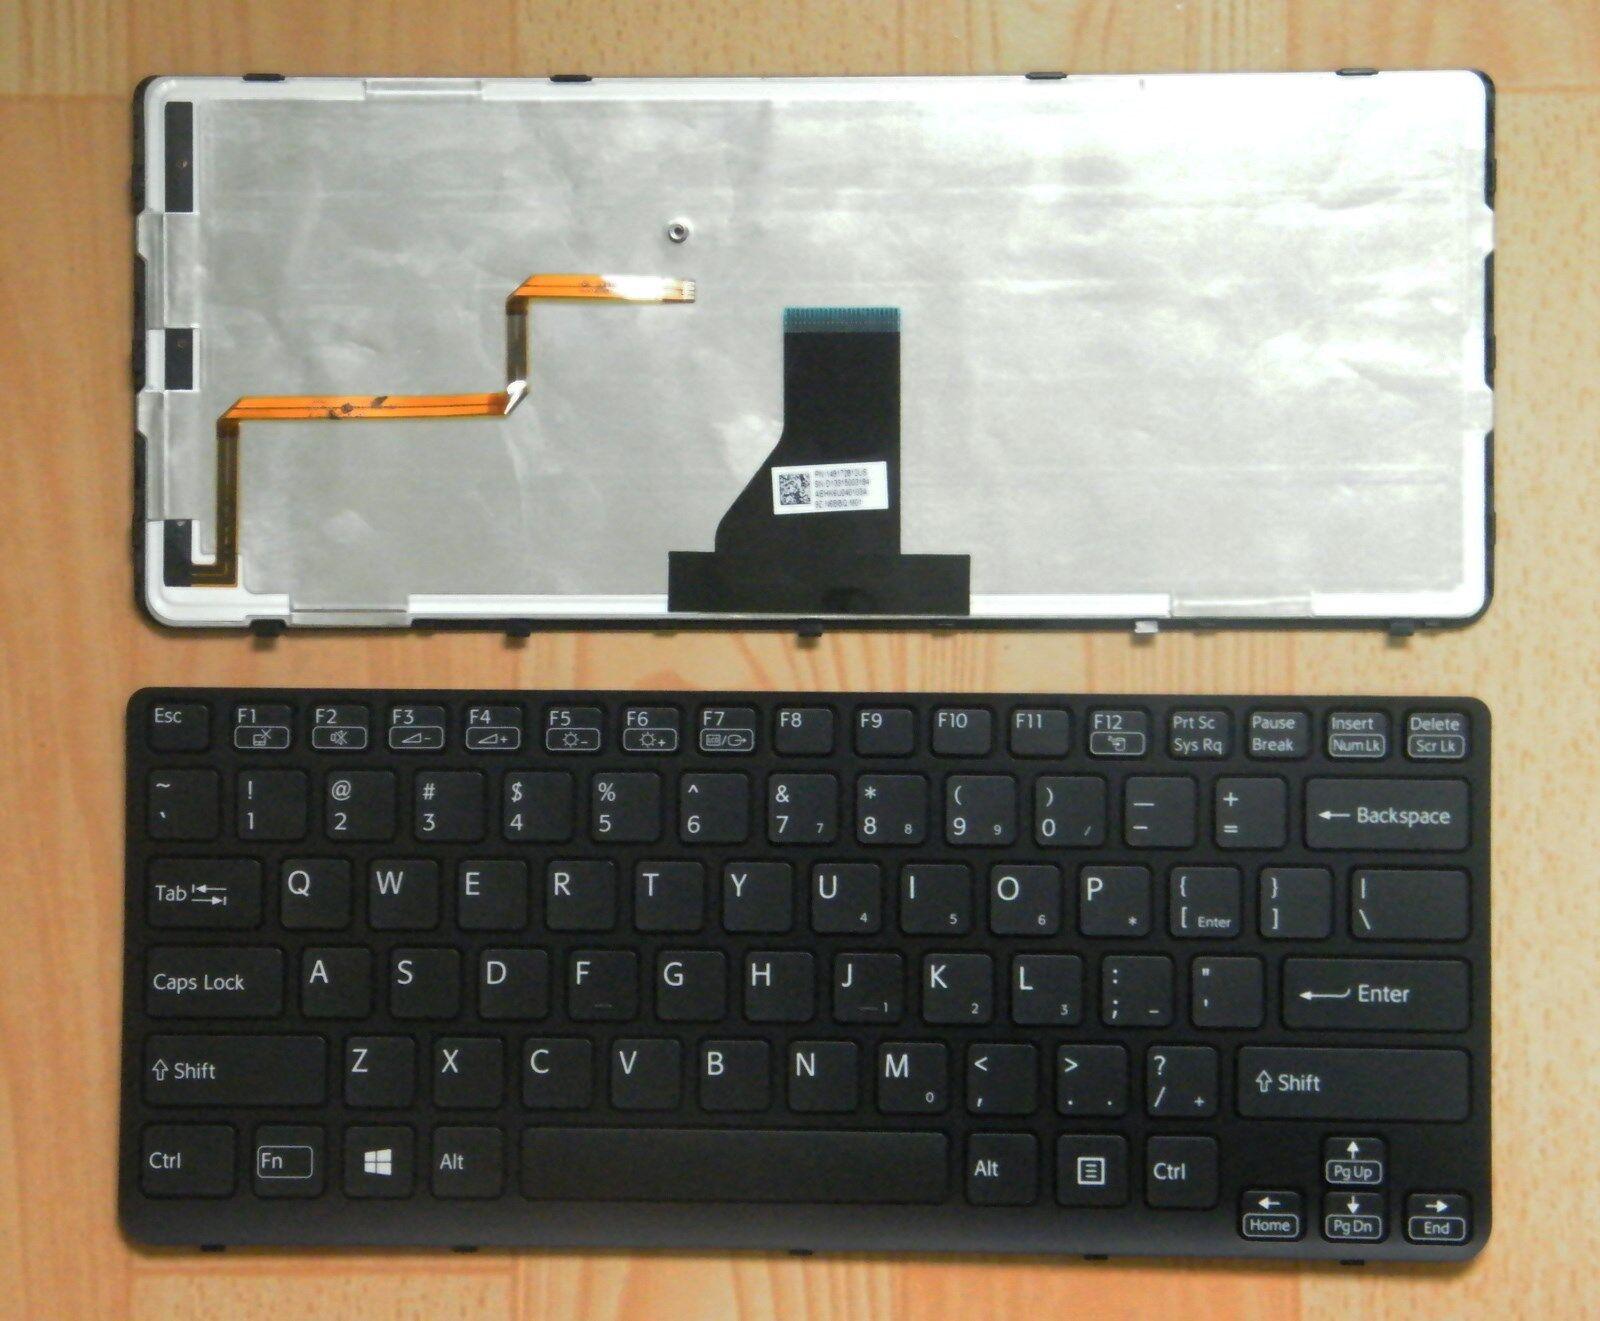 Keyboards4Laptops German Layout Grey Frame Backlit Black Windows 8 Laptop Keyboard For Sony Vaio SVE1512GCXW Sony Vaio SVE1512H1EW Sony Vaio SVE1512H1ESI Sony Vaio SVE1512H1E Sony Vaio SVE1512H1EB